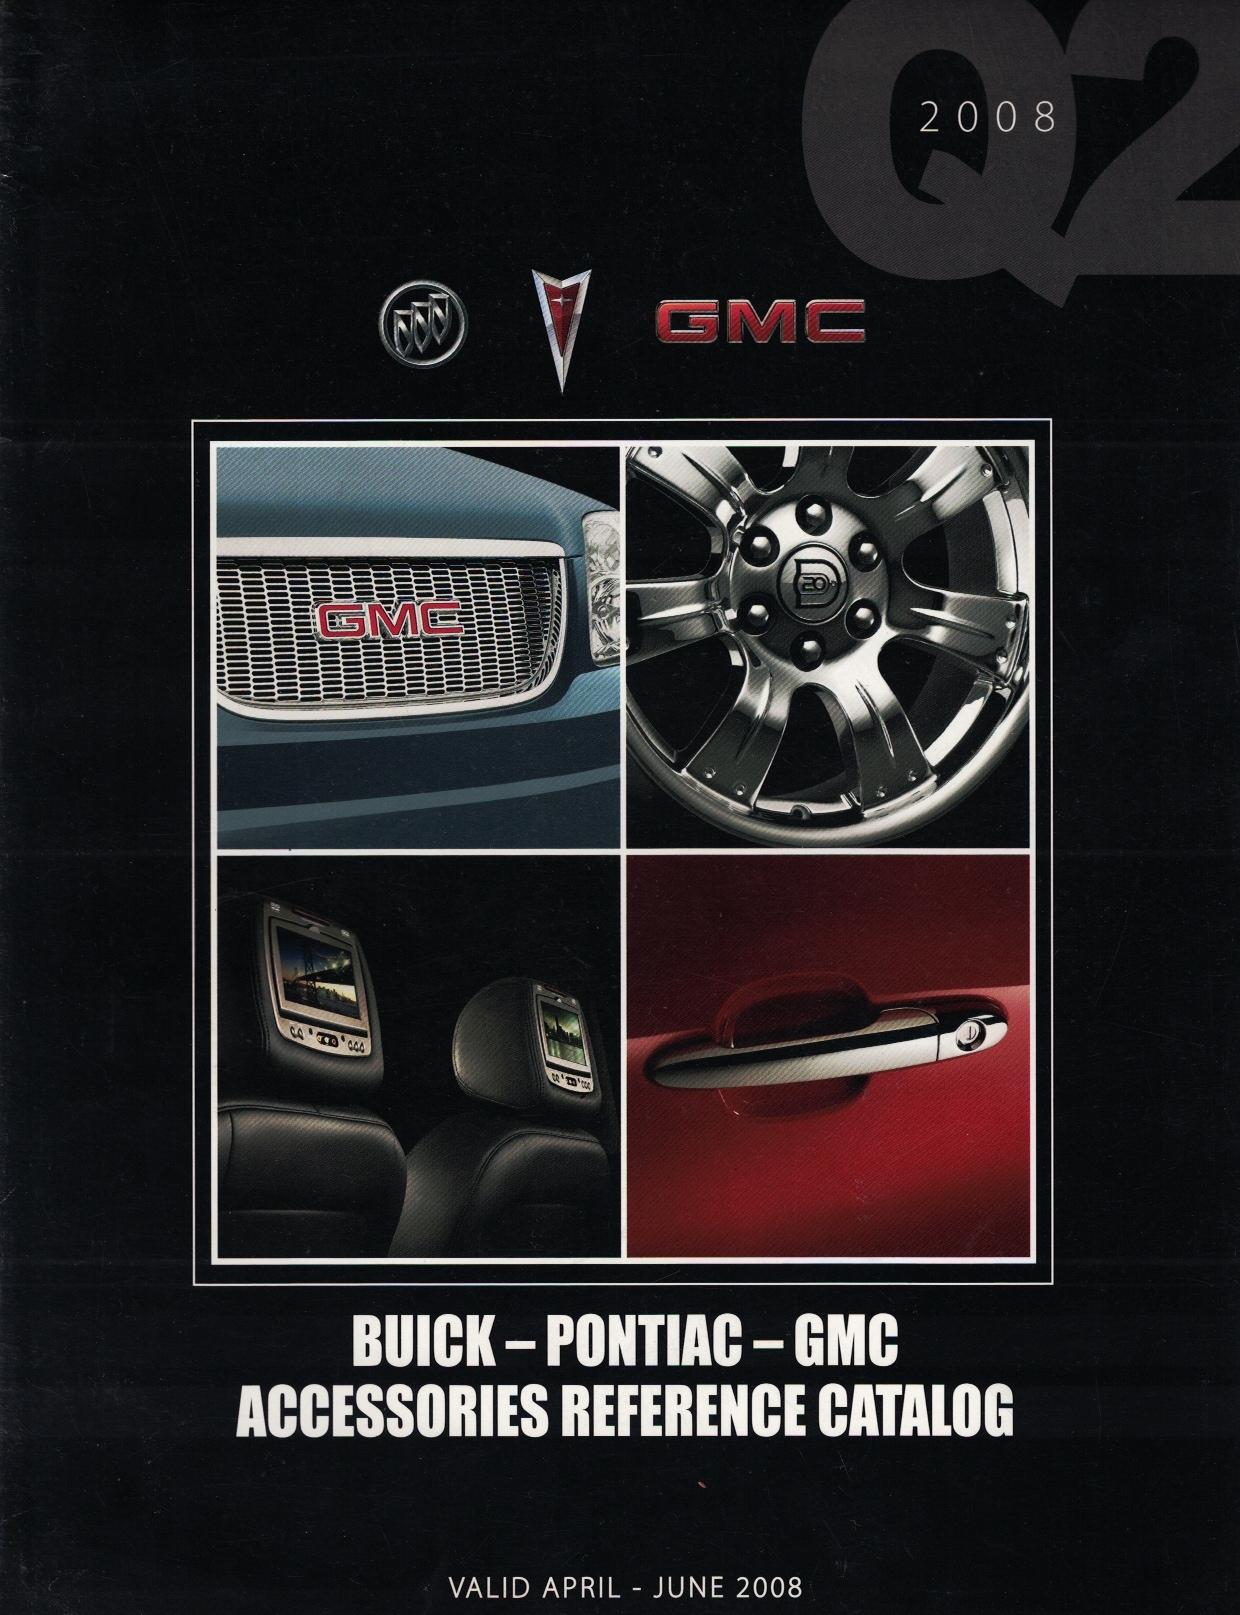 Image for 2008 Second Quarter (Q2) Buick - Pontiac - GMC Accessories Reference Catalog